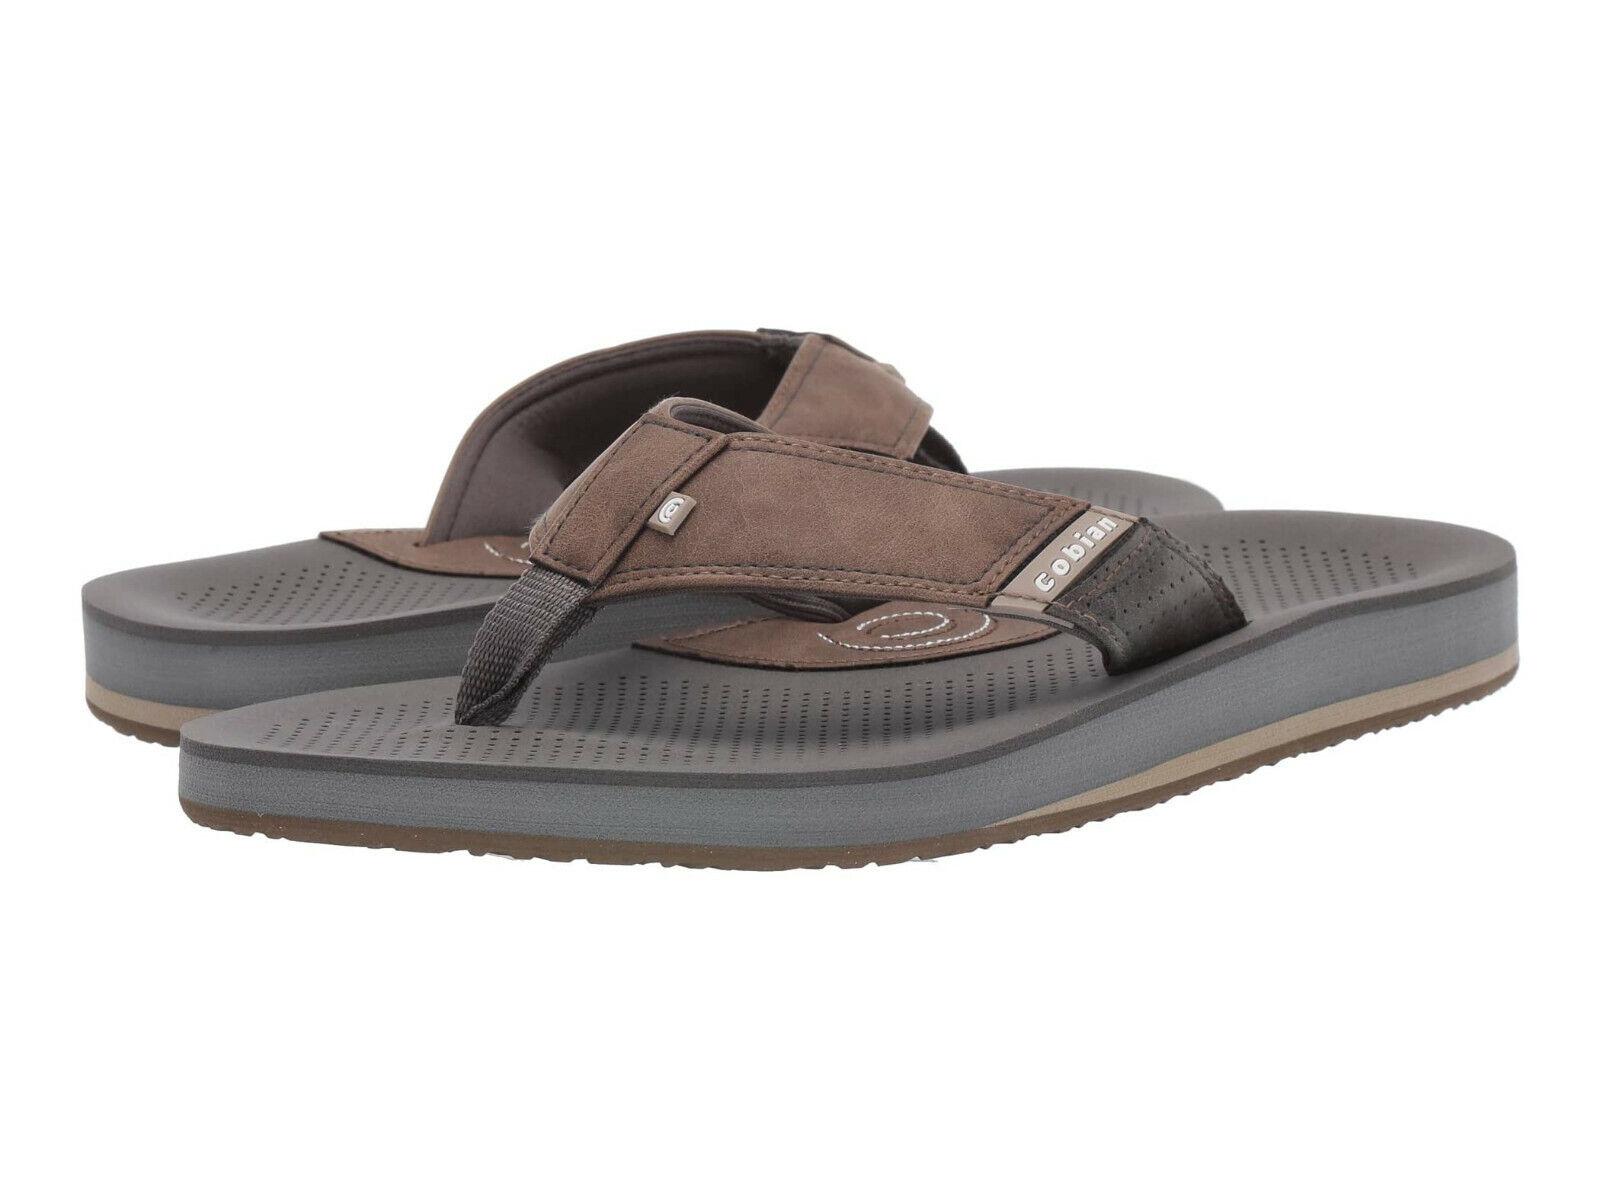 Men Cobian ARV2 FlipFlop Sandal ARV19-201 Chocolate 100% Authentic Brand New